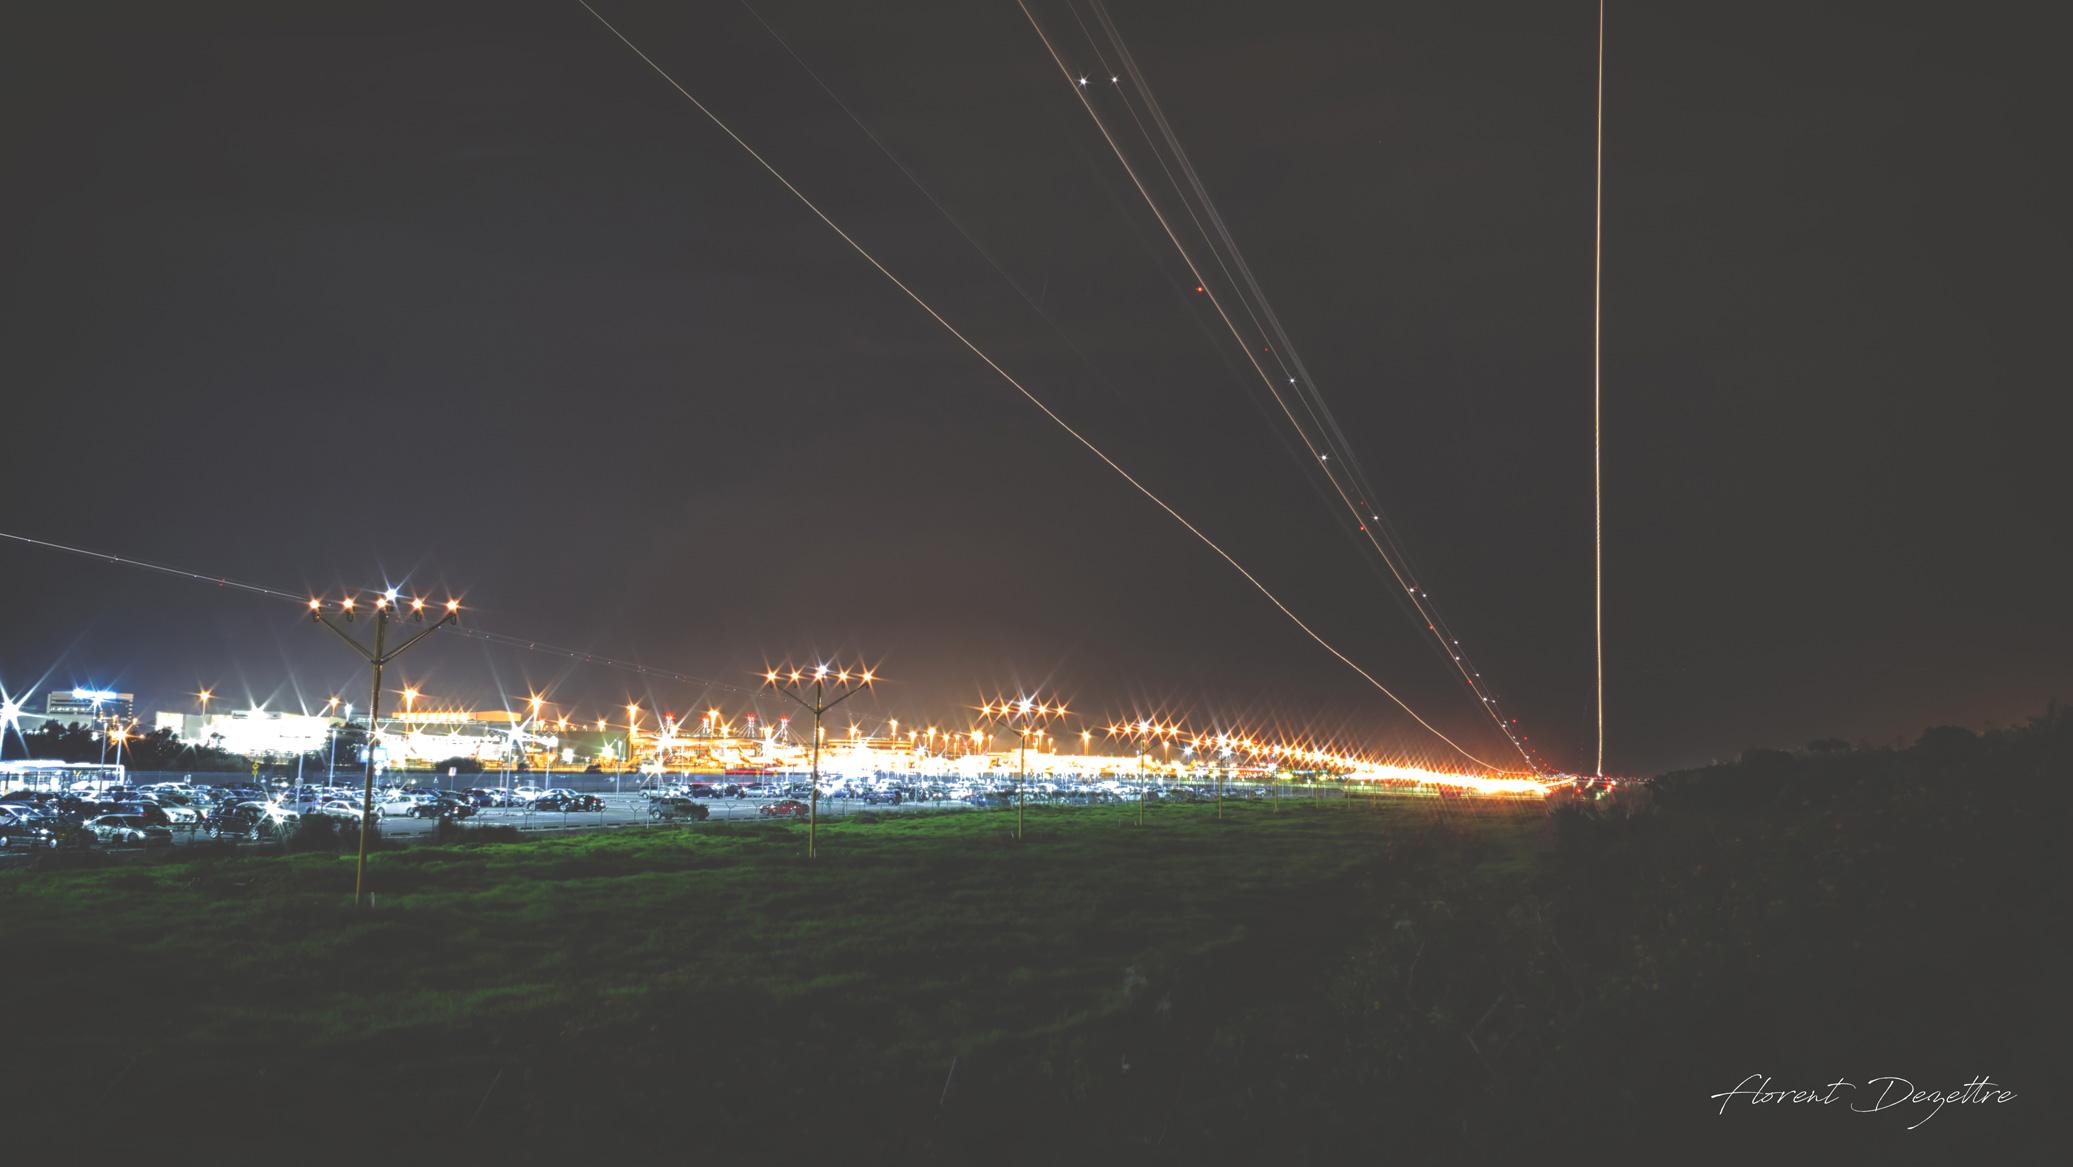 Plane-Trails